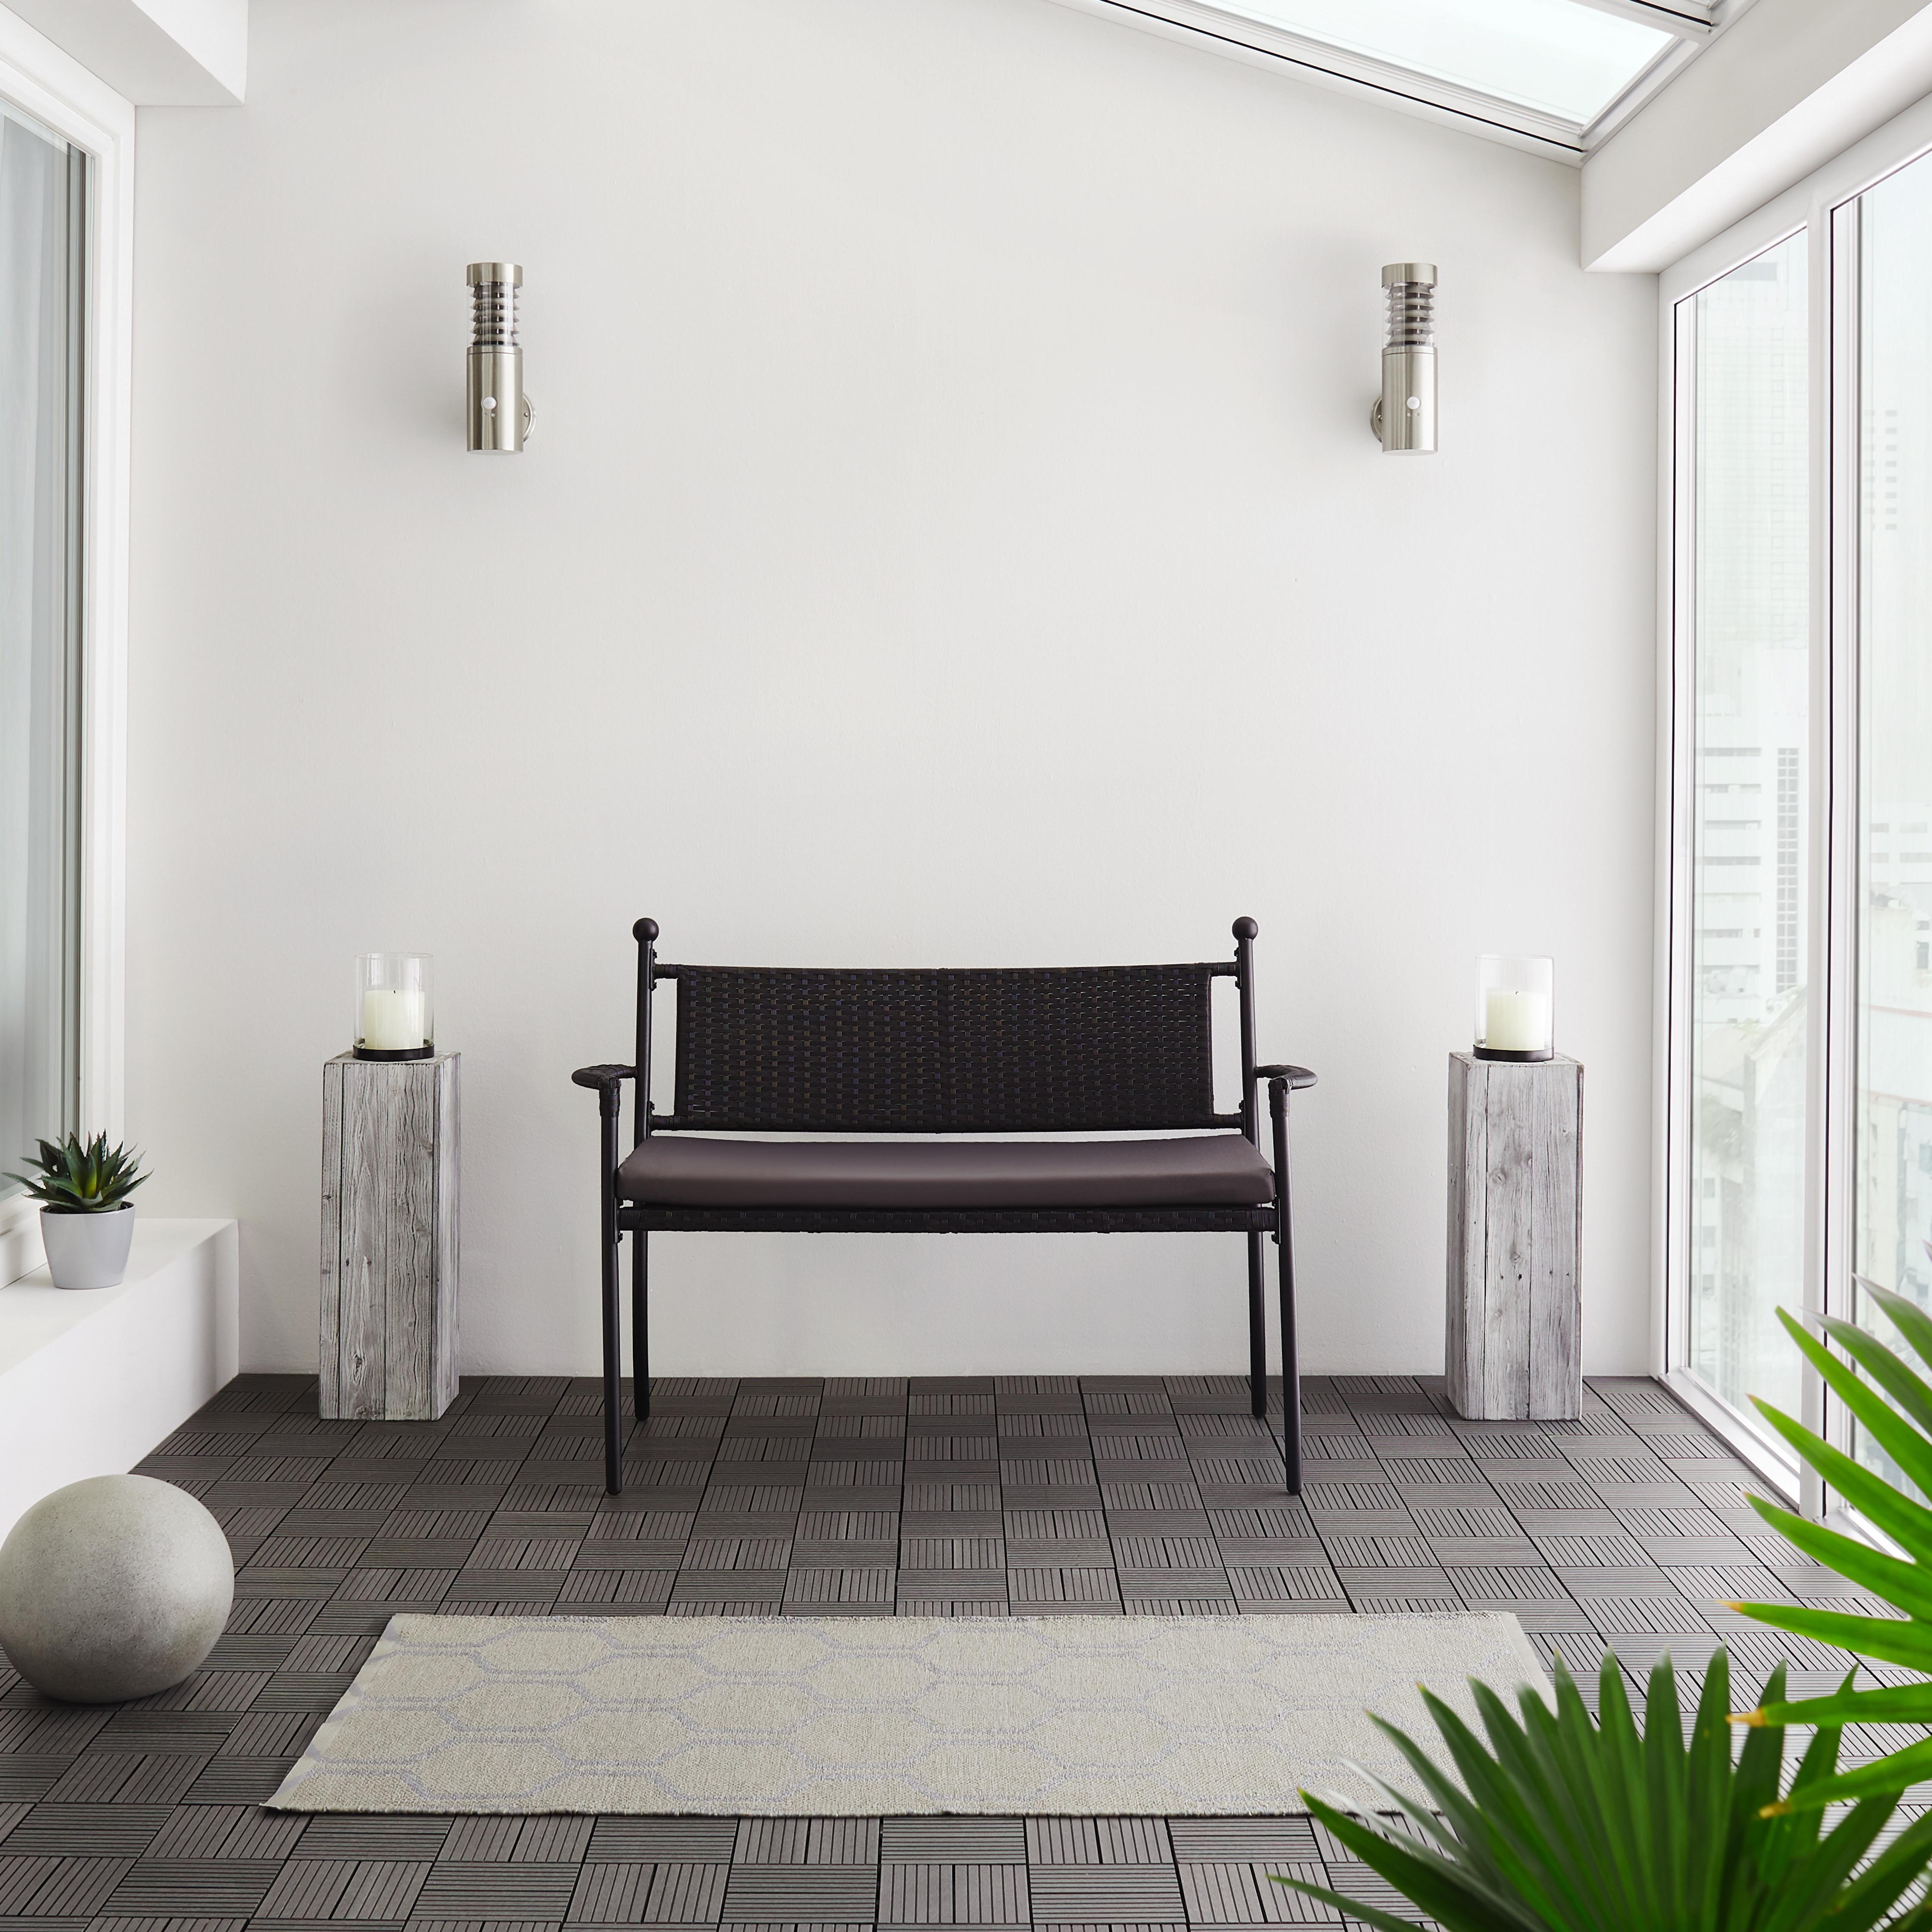 Gartenbank Eva inkl. Auflage - Dunkelgrau/Schwarz, MODERN, Kunststoff/Textil (120/85/60cm) - Modern Living